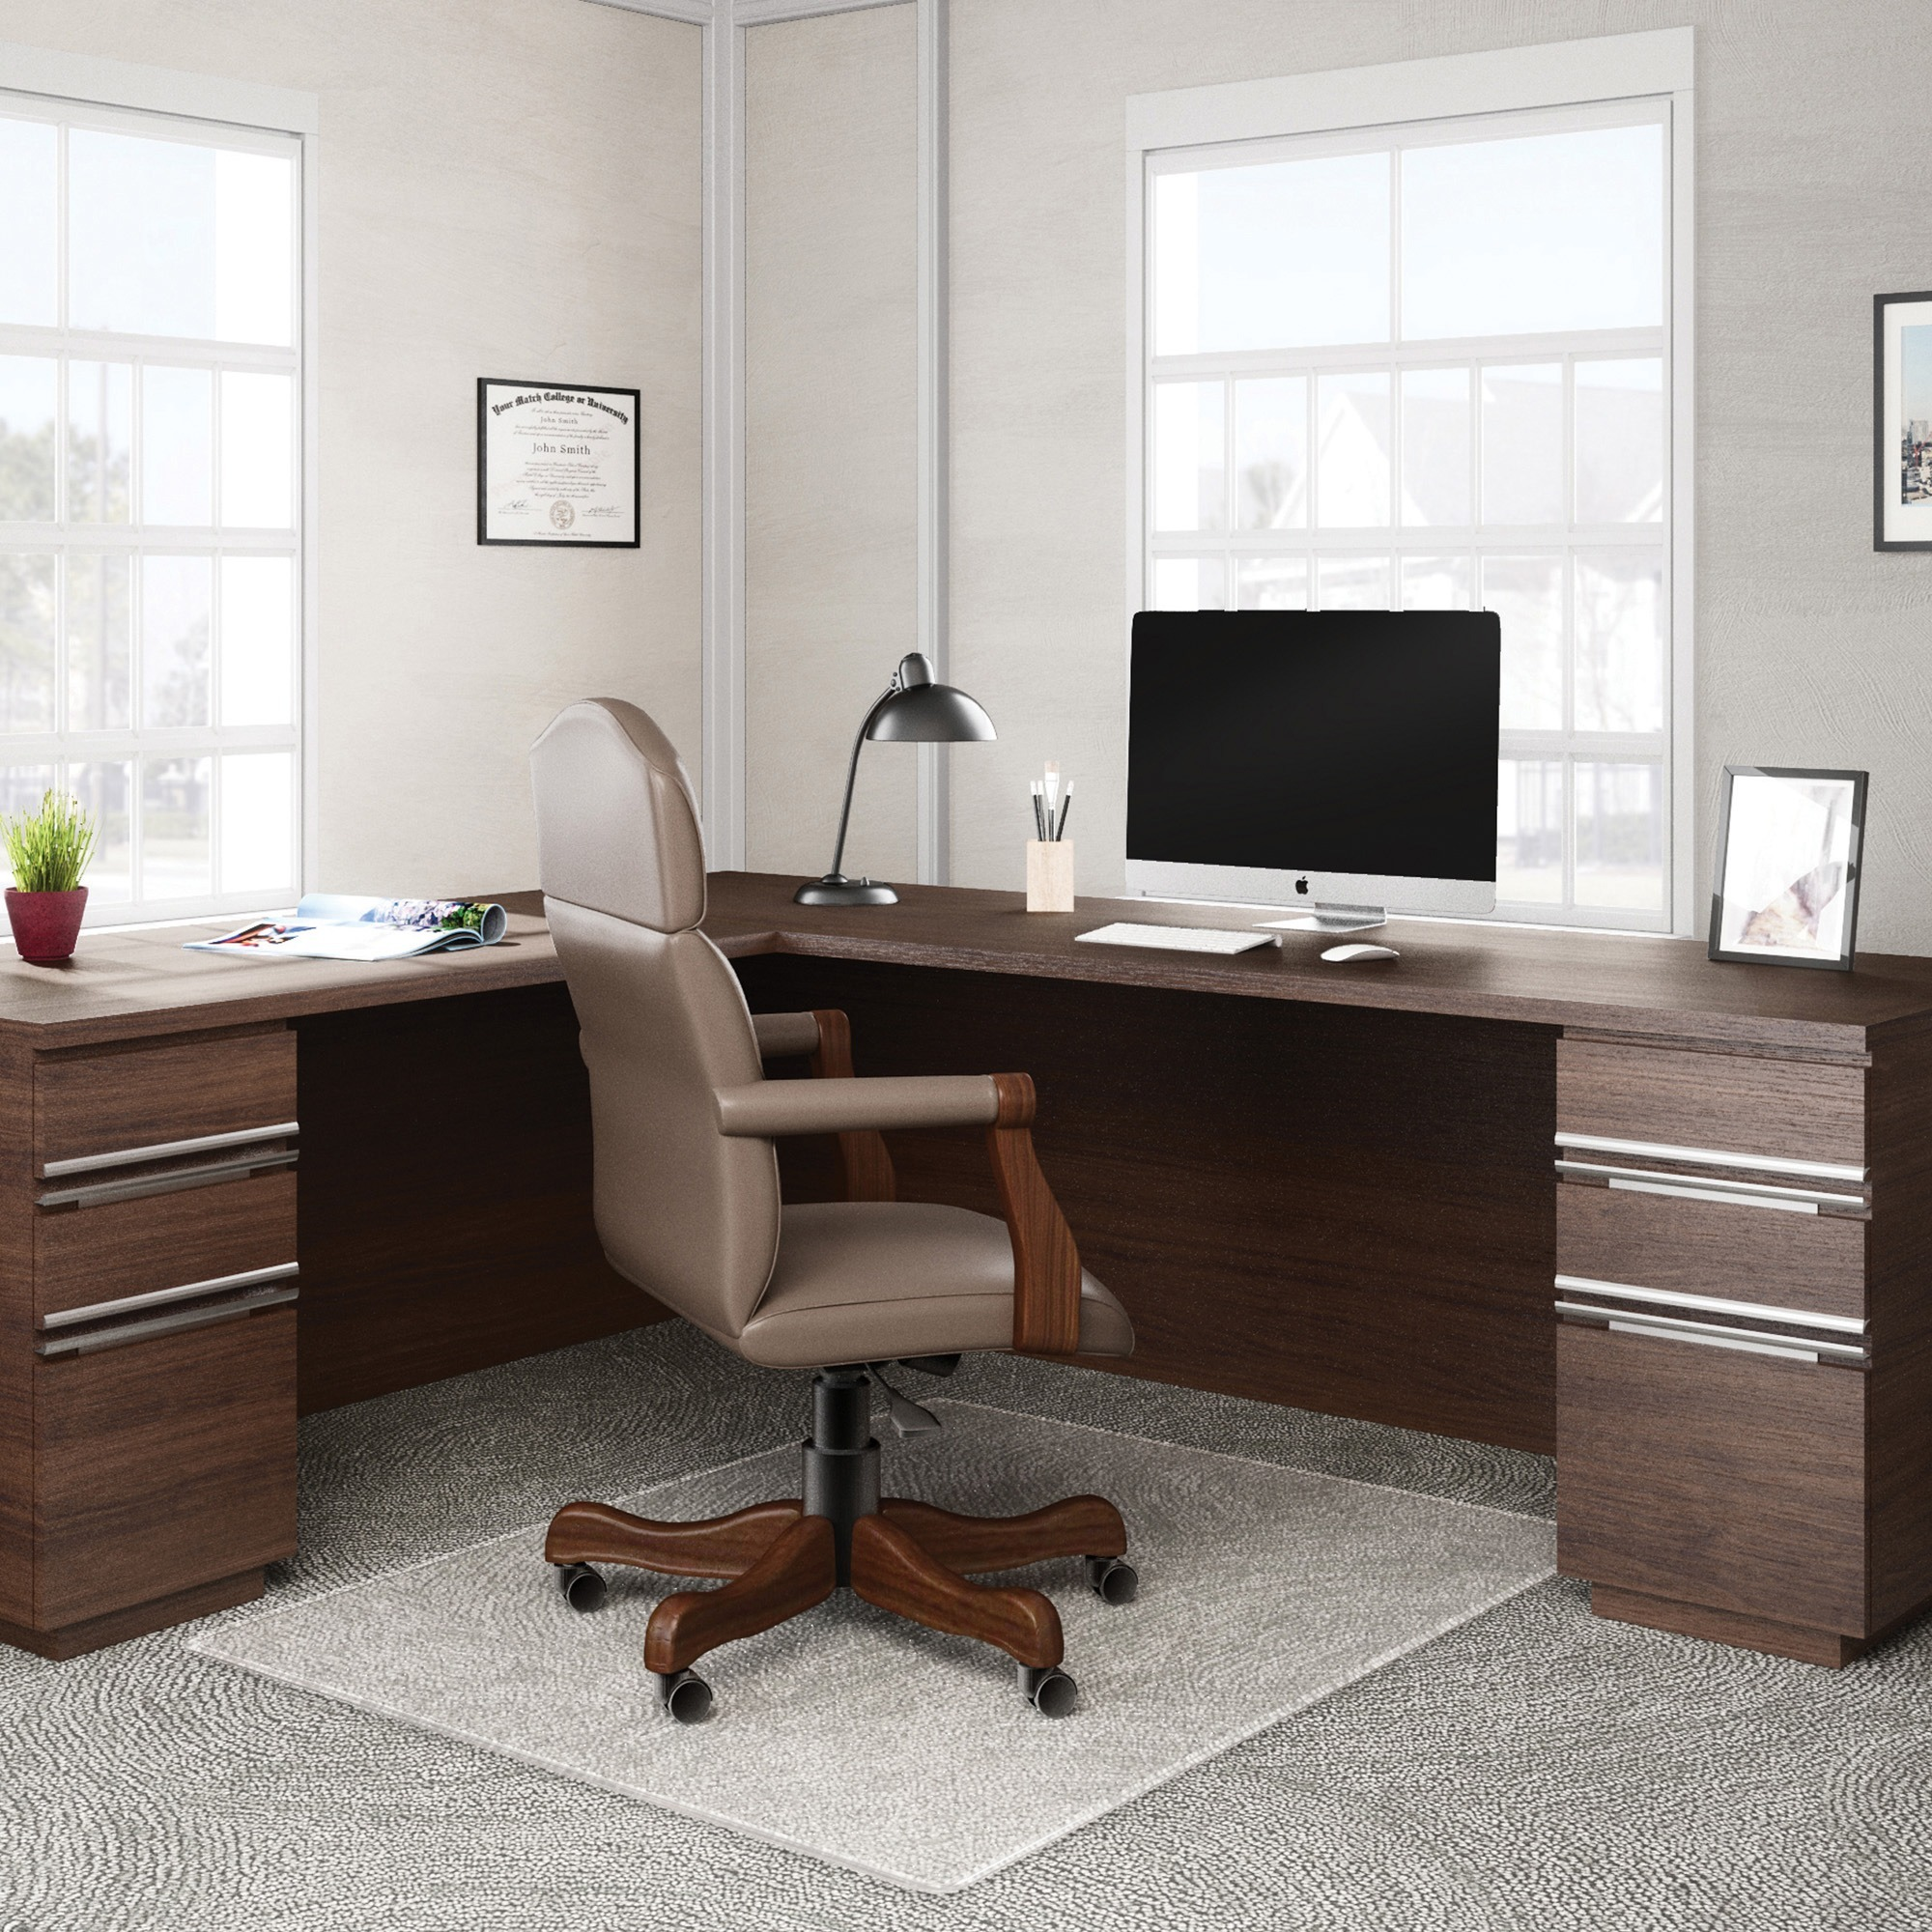 okanagan office systems furniture chairs chair mats